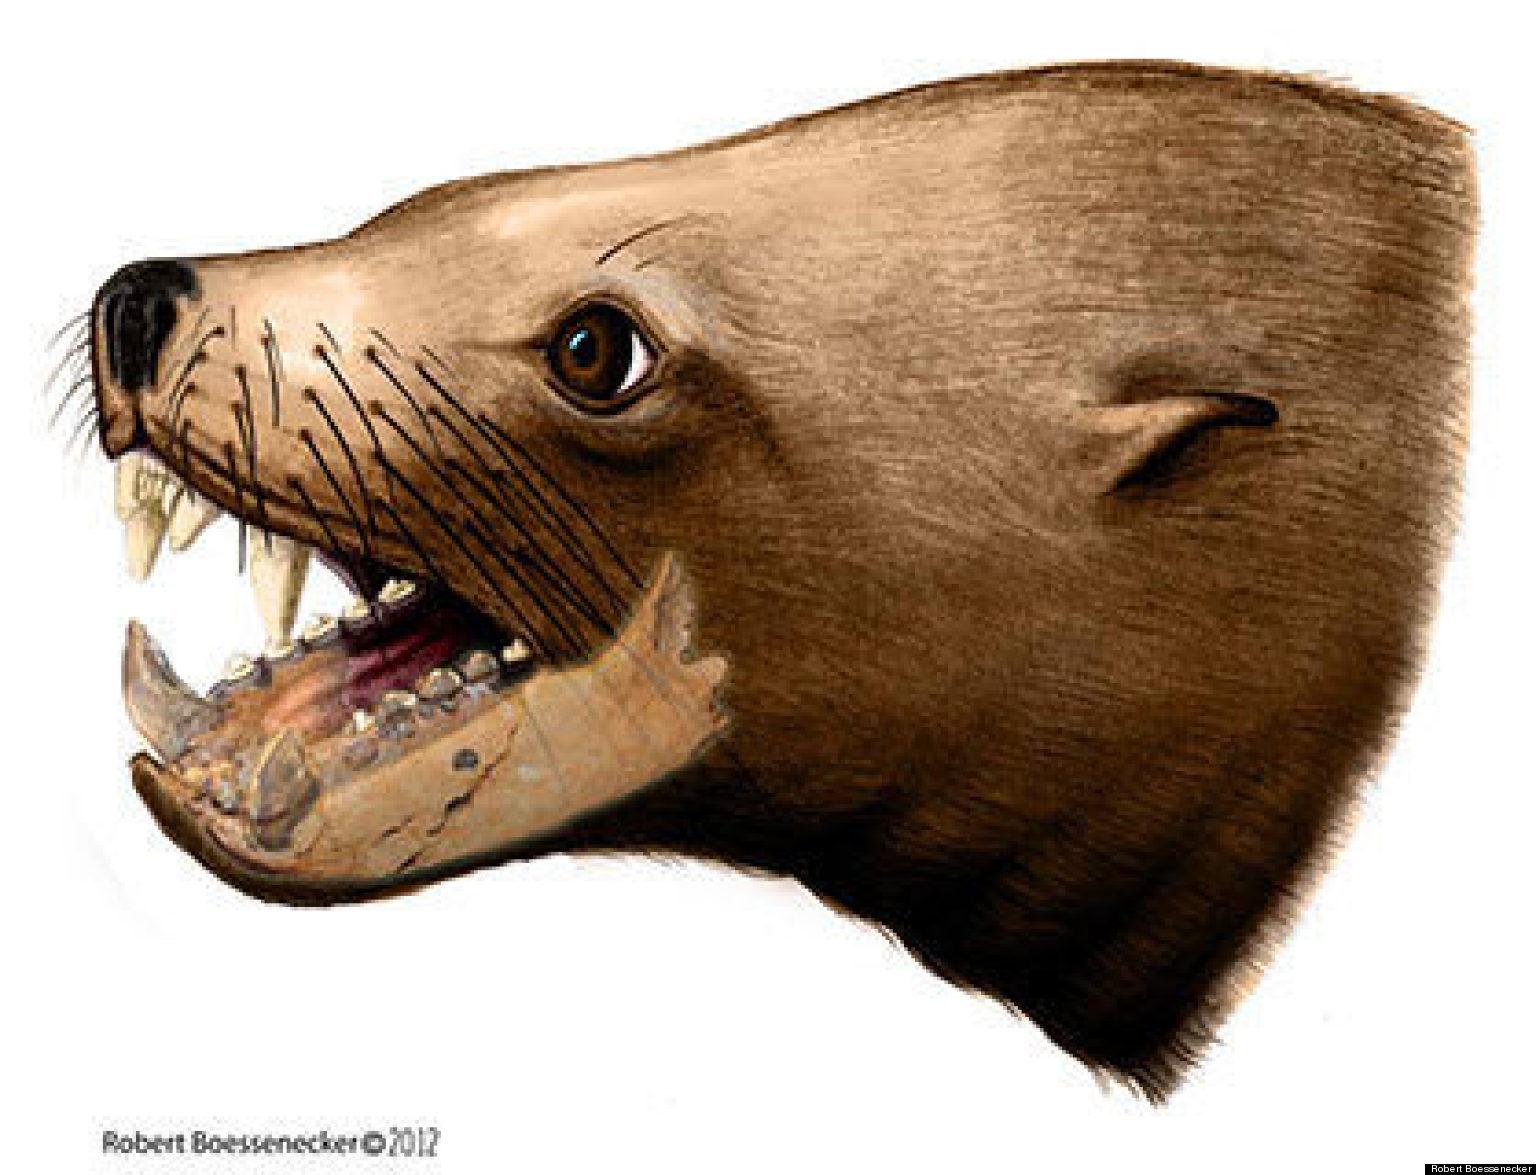 Killer Walrus Teeth Fossils Suggest Prehistoric Mammal